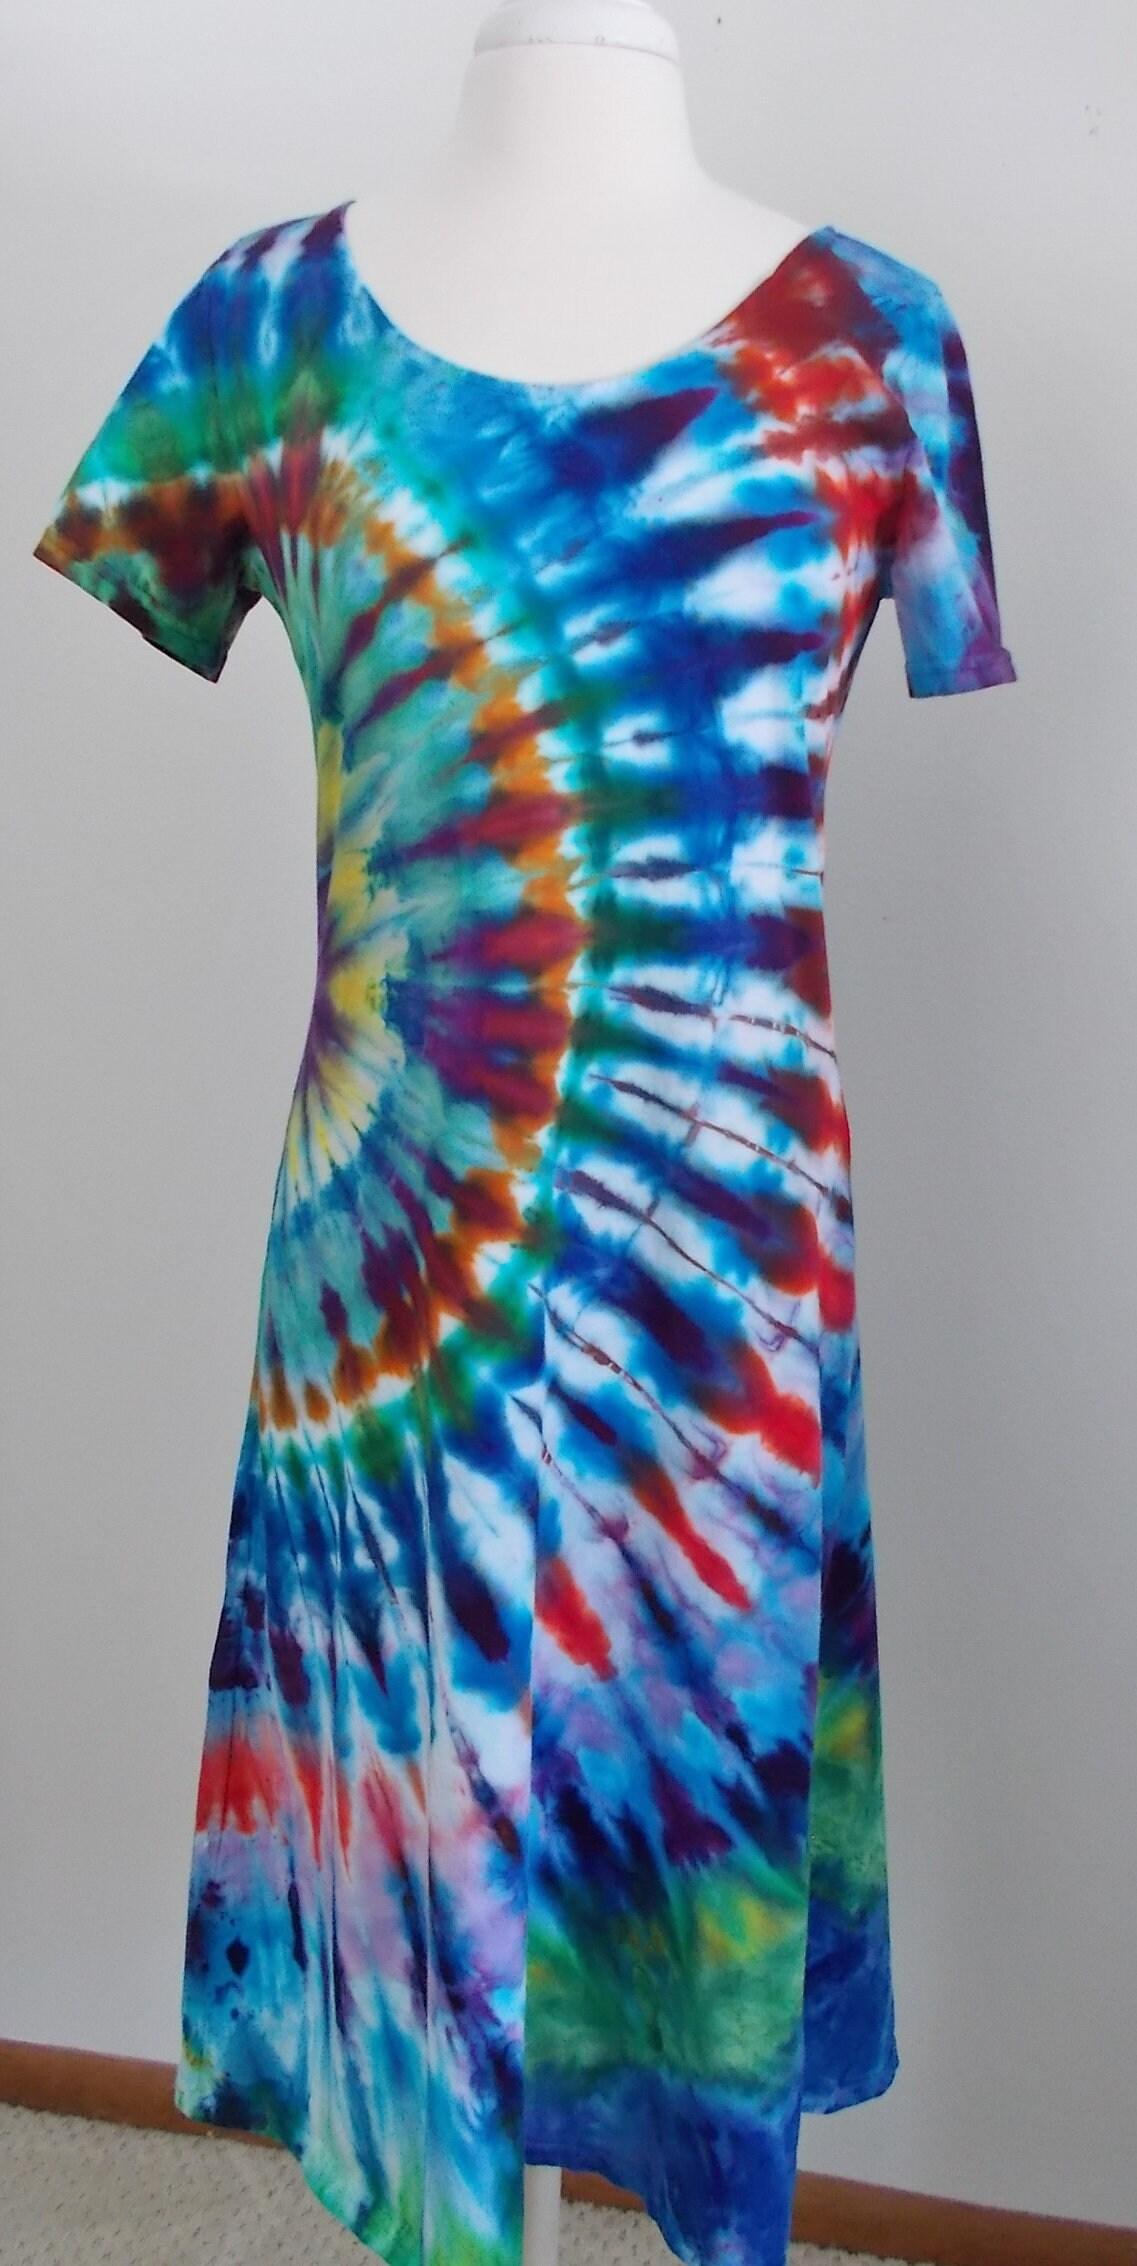 df26c6295a6 Ice dye tie dye Cotton Dress Medium short sleeve Multi